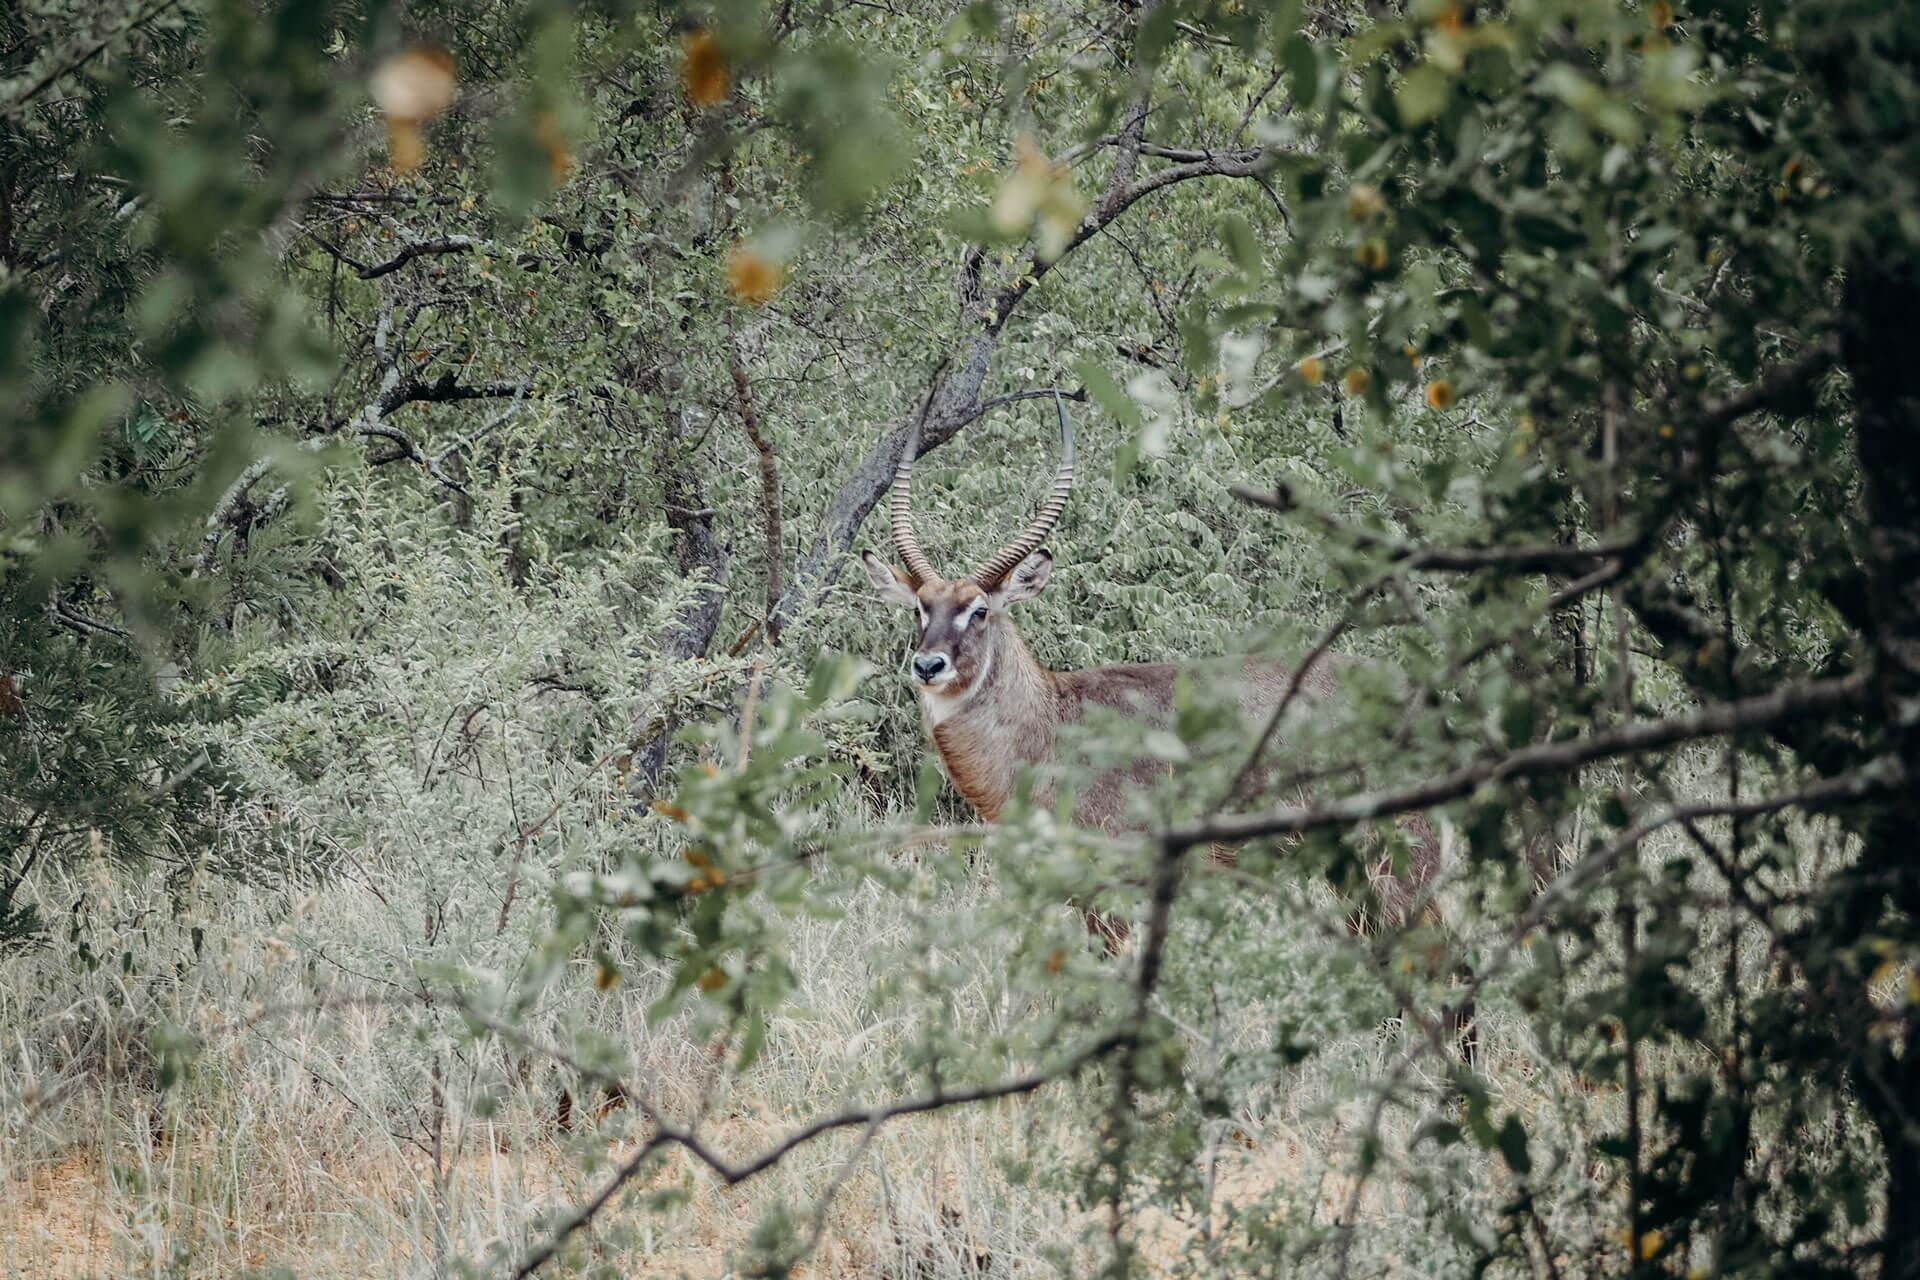 Waterbuck hiding